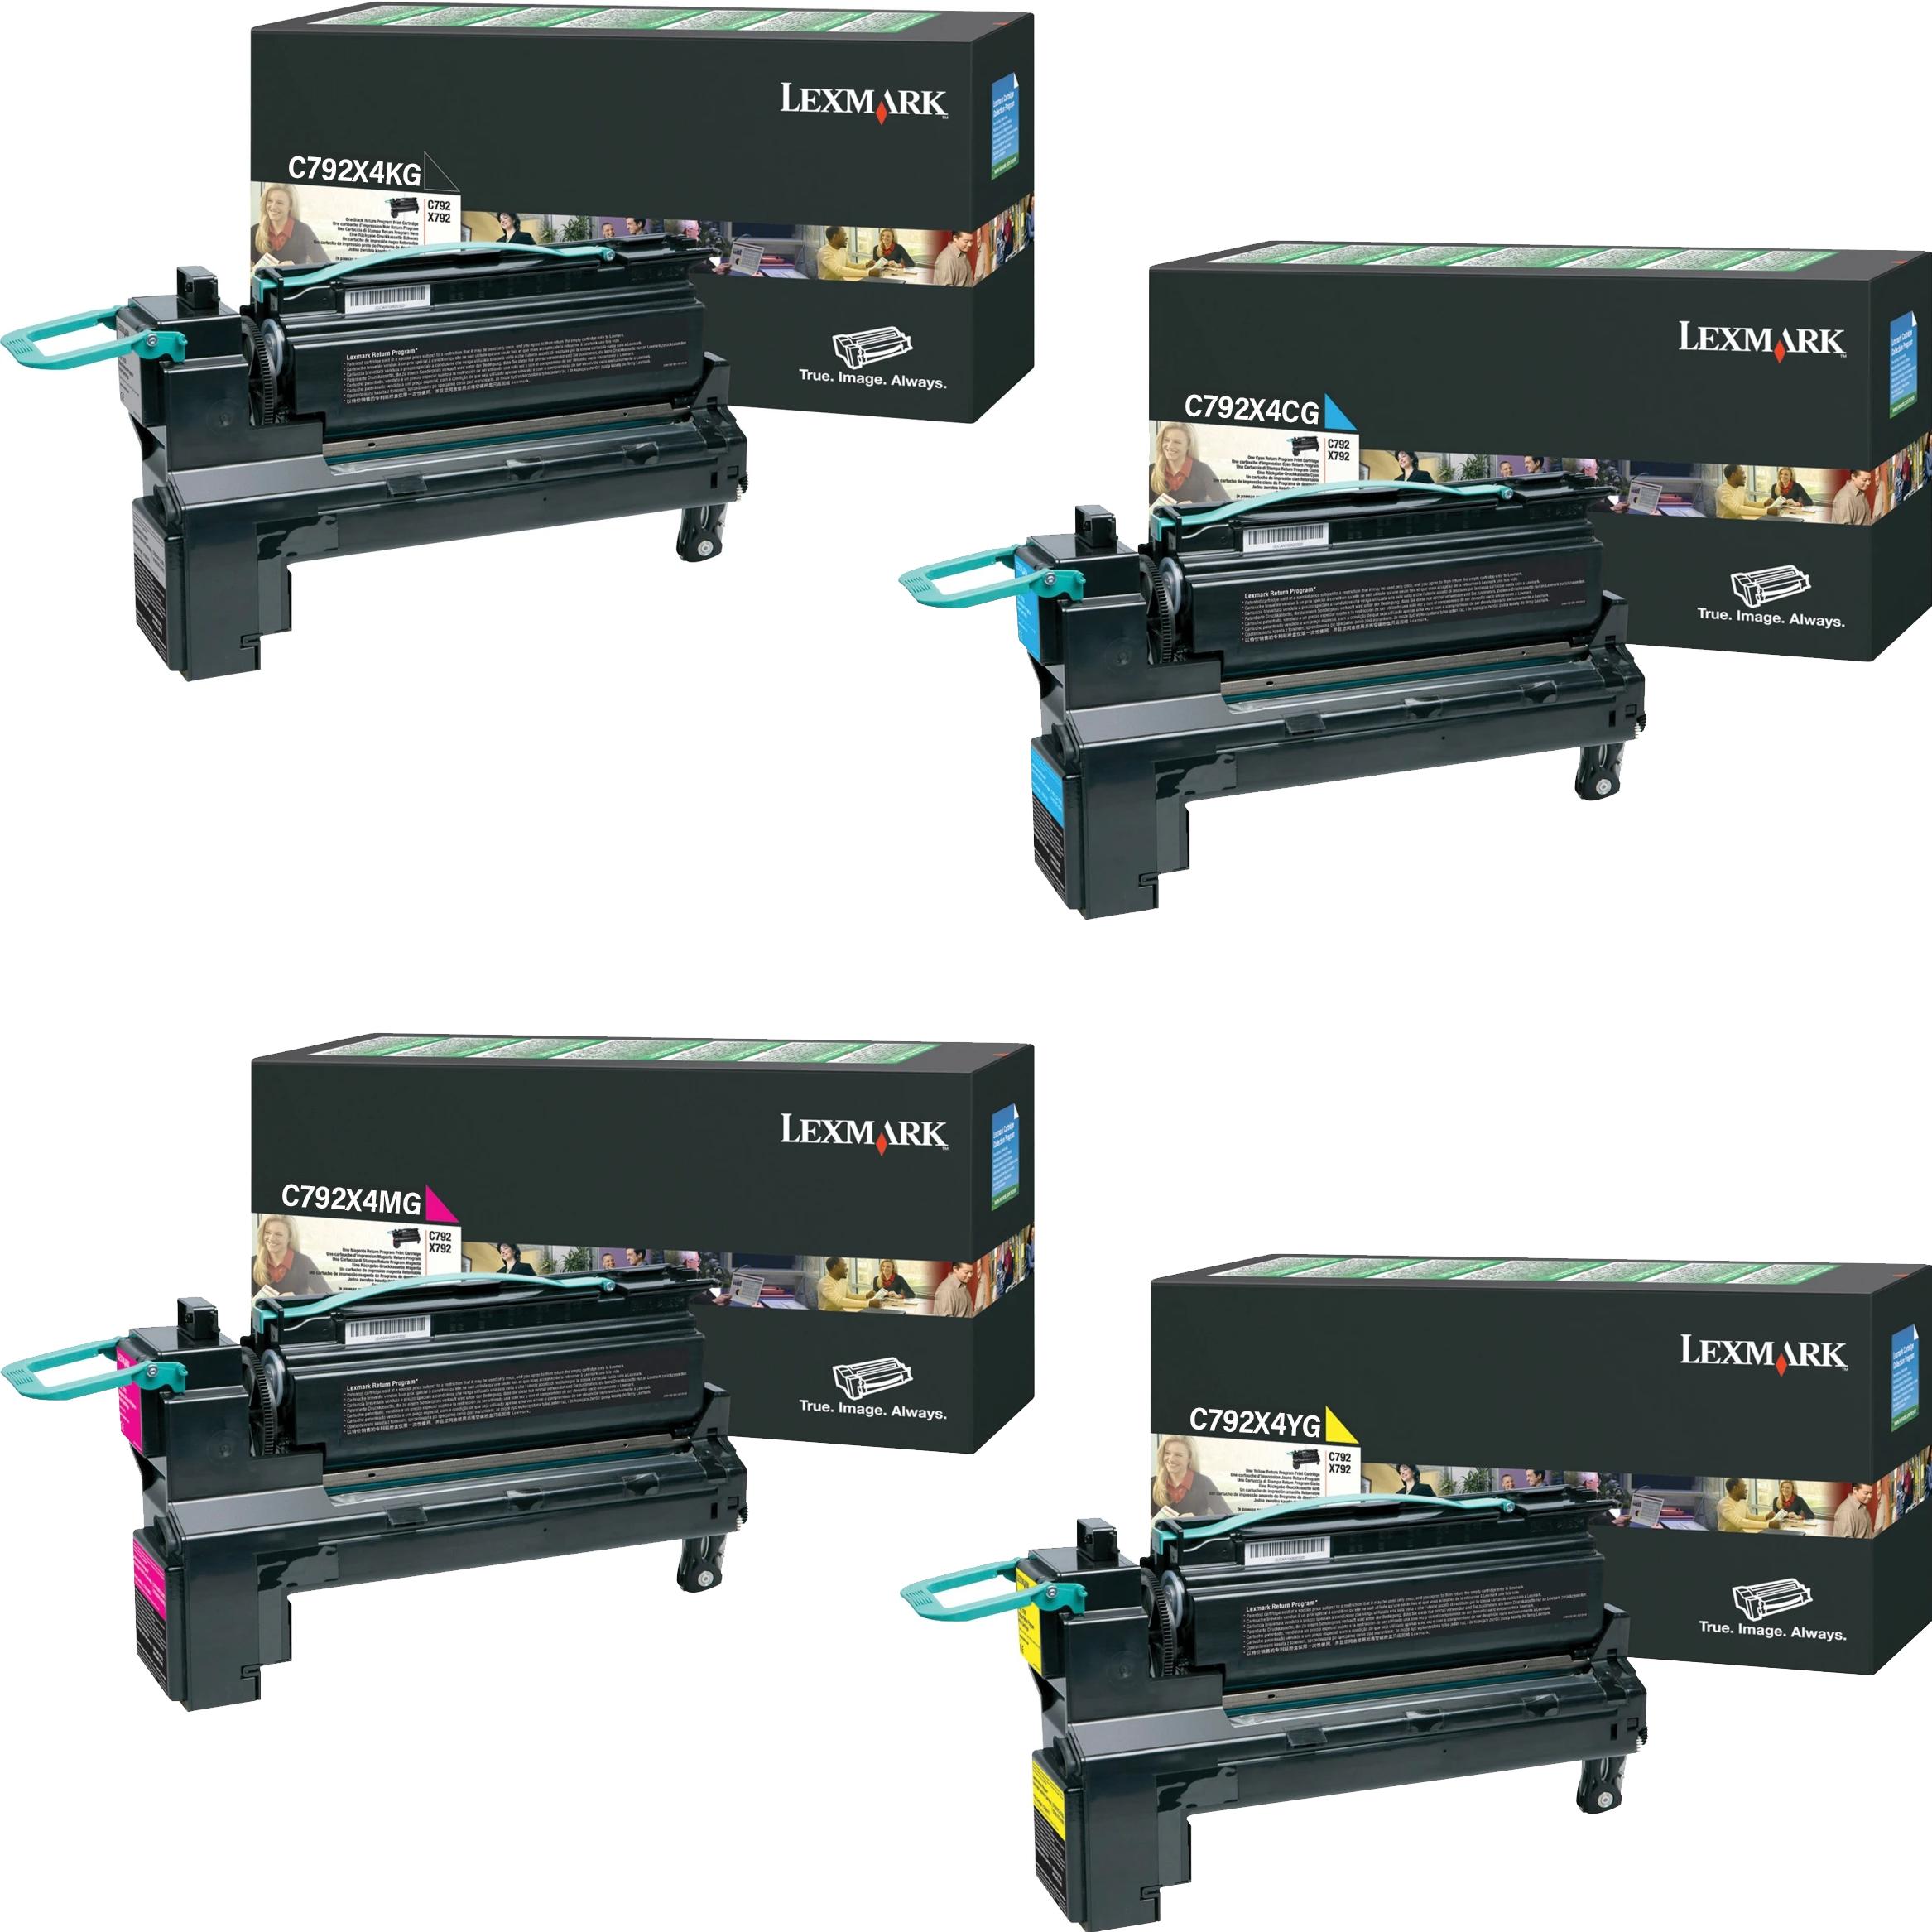 Lexmark C792X4 Set | C792X4CG C792X4KG C792X4MG C792X4YG | Original Lexmark Extra High-Yield Toner Cartridges – Black, Cyan, Magenta, Yellow